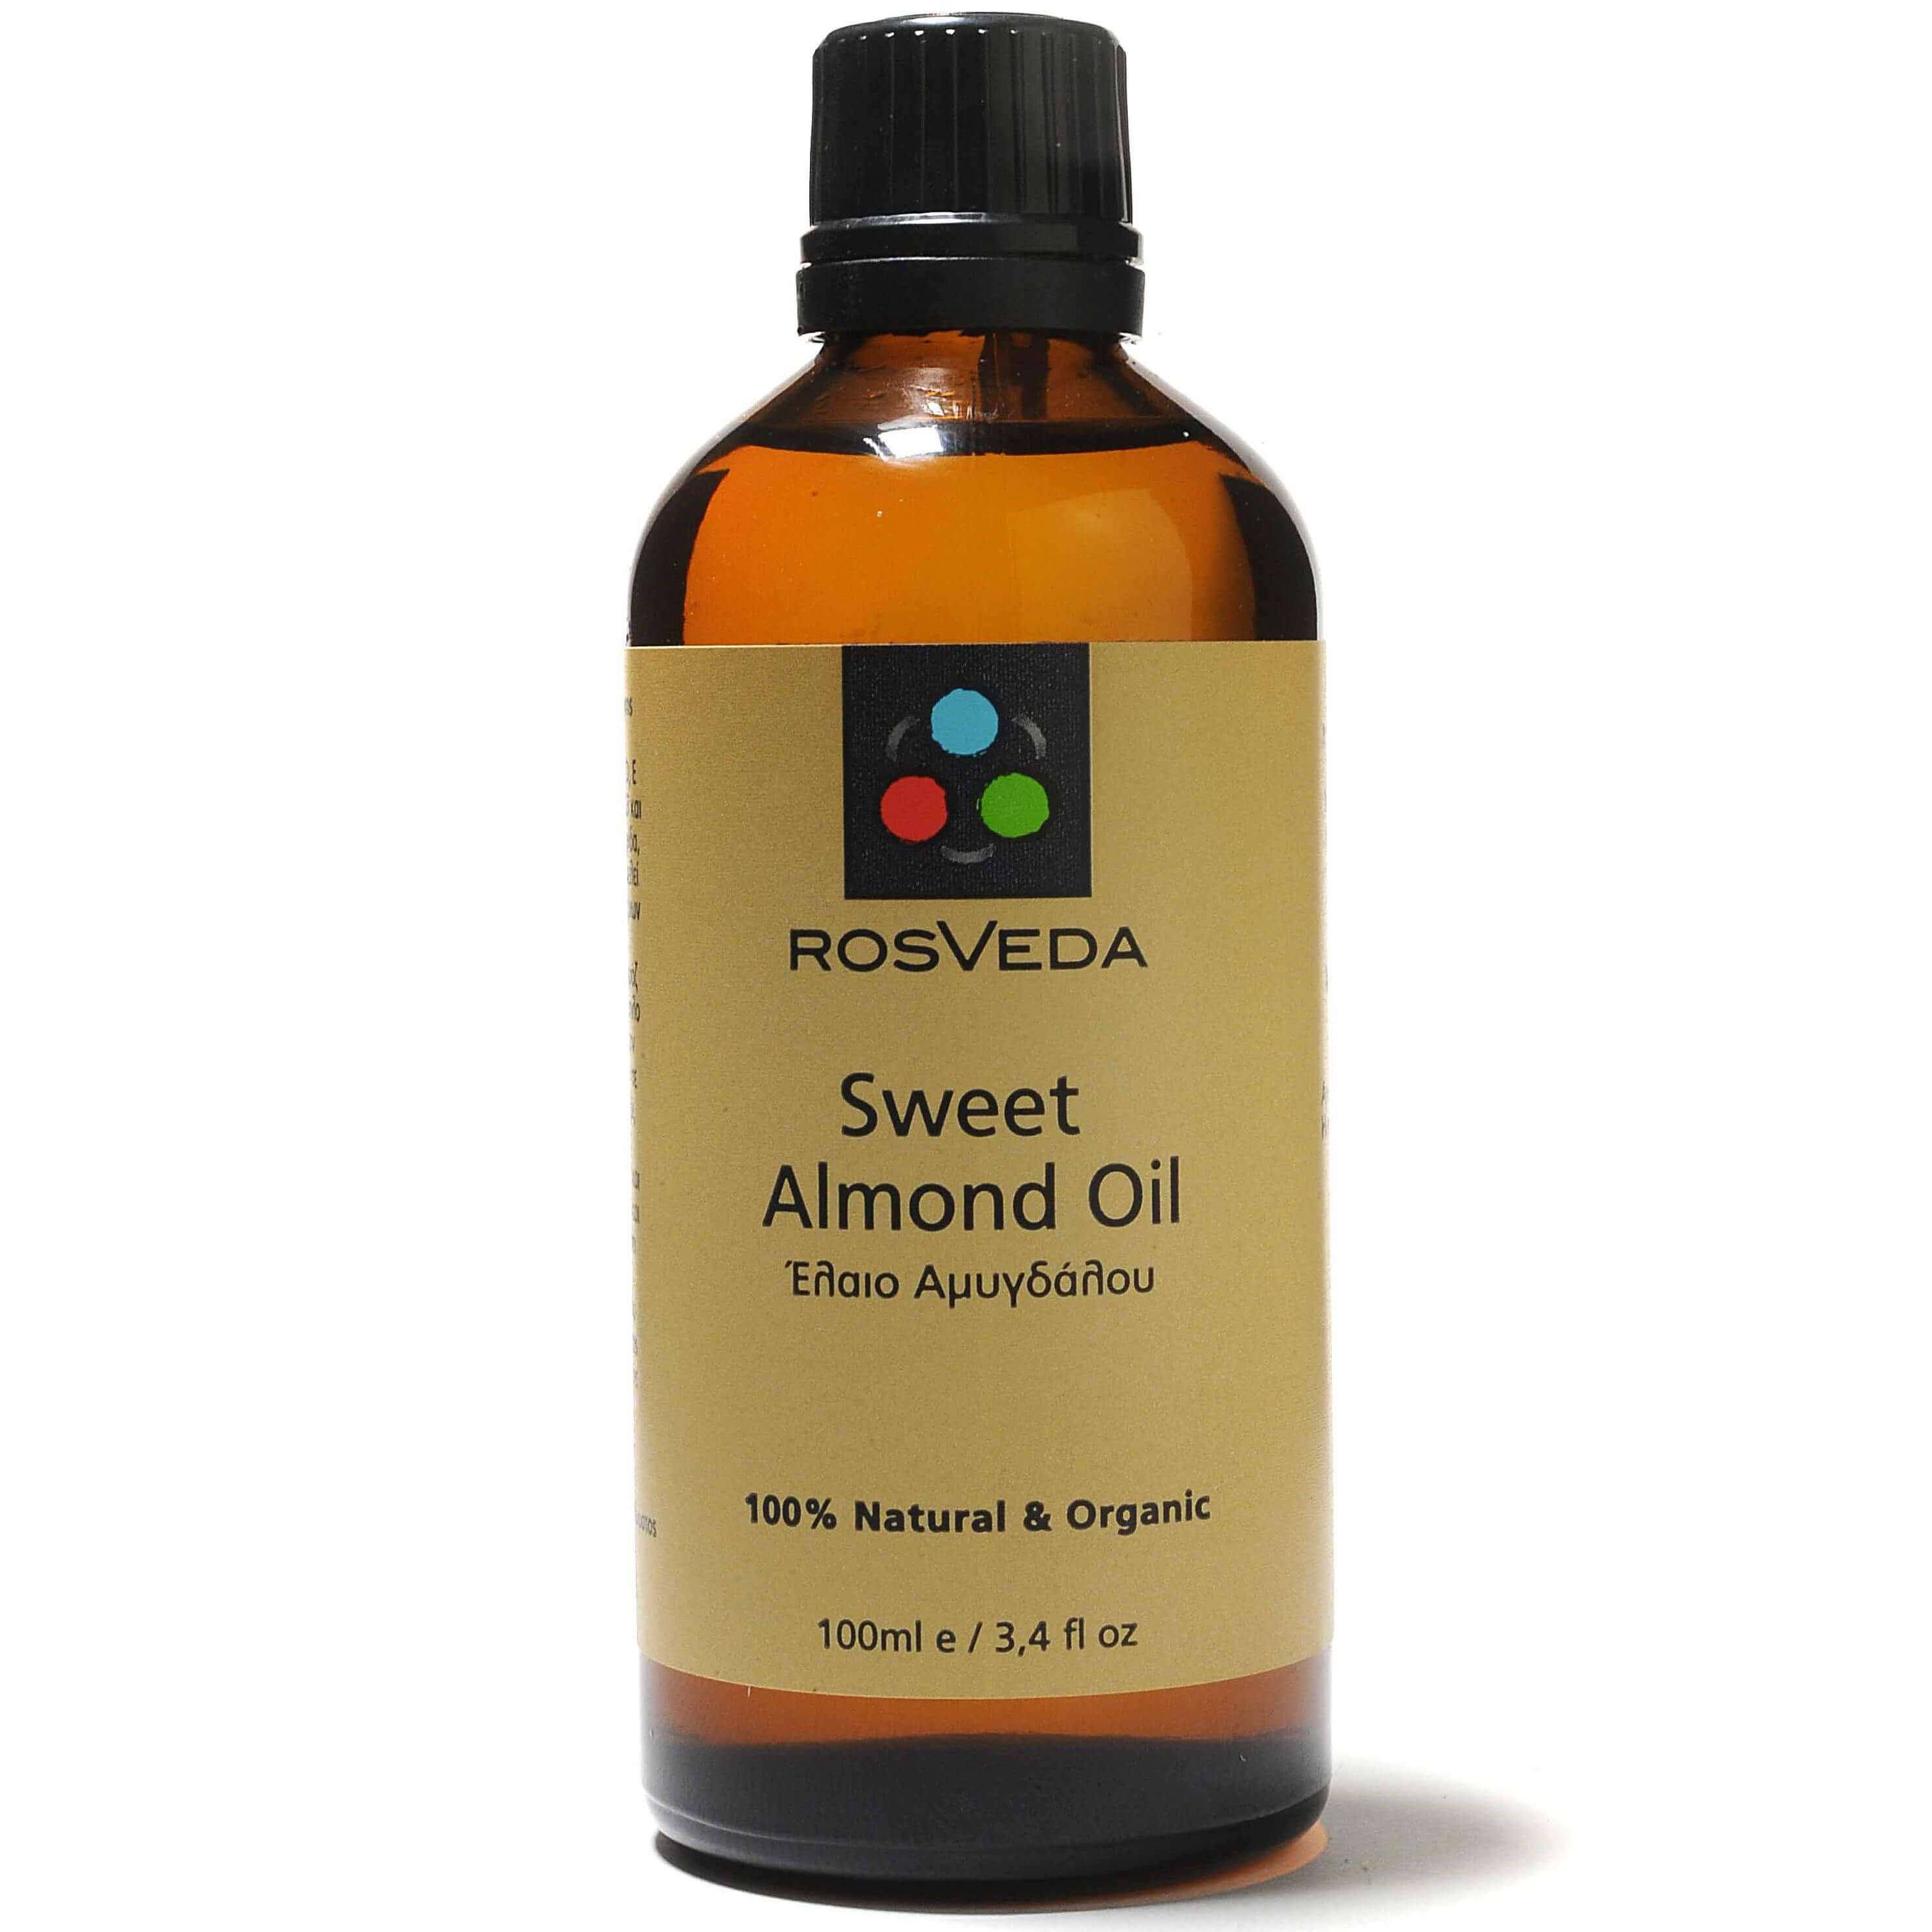 Rosveda Almond Oil 100% Φυτική Σύνθεση, Έλαιο Αμυγδάλου, Βάση Ανάμειξης Αιθέριων Ελαίων 100ml